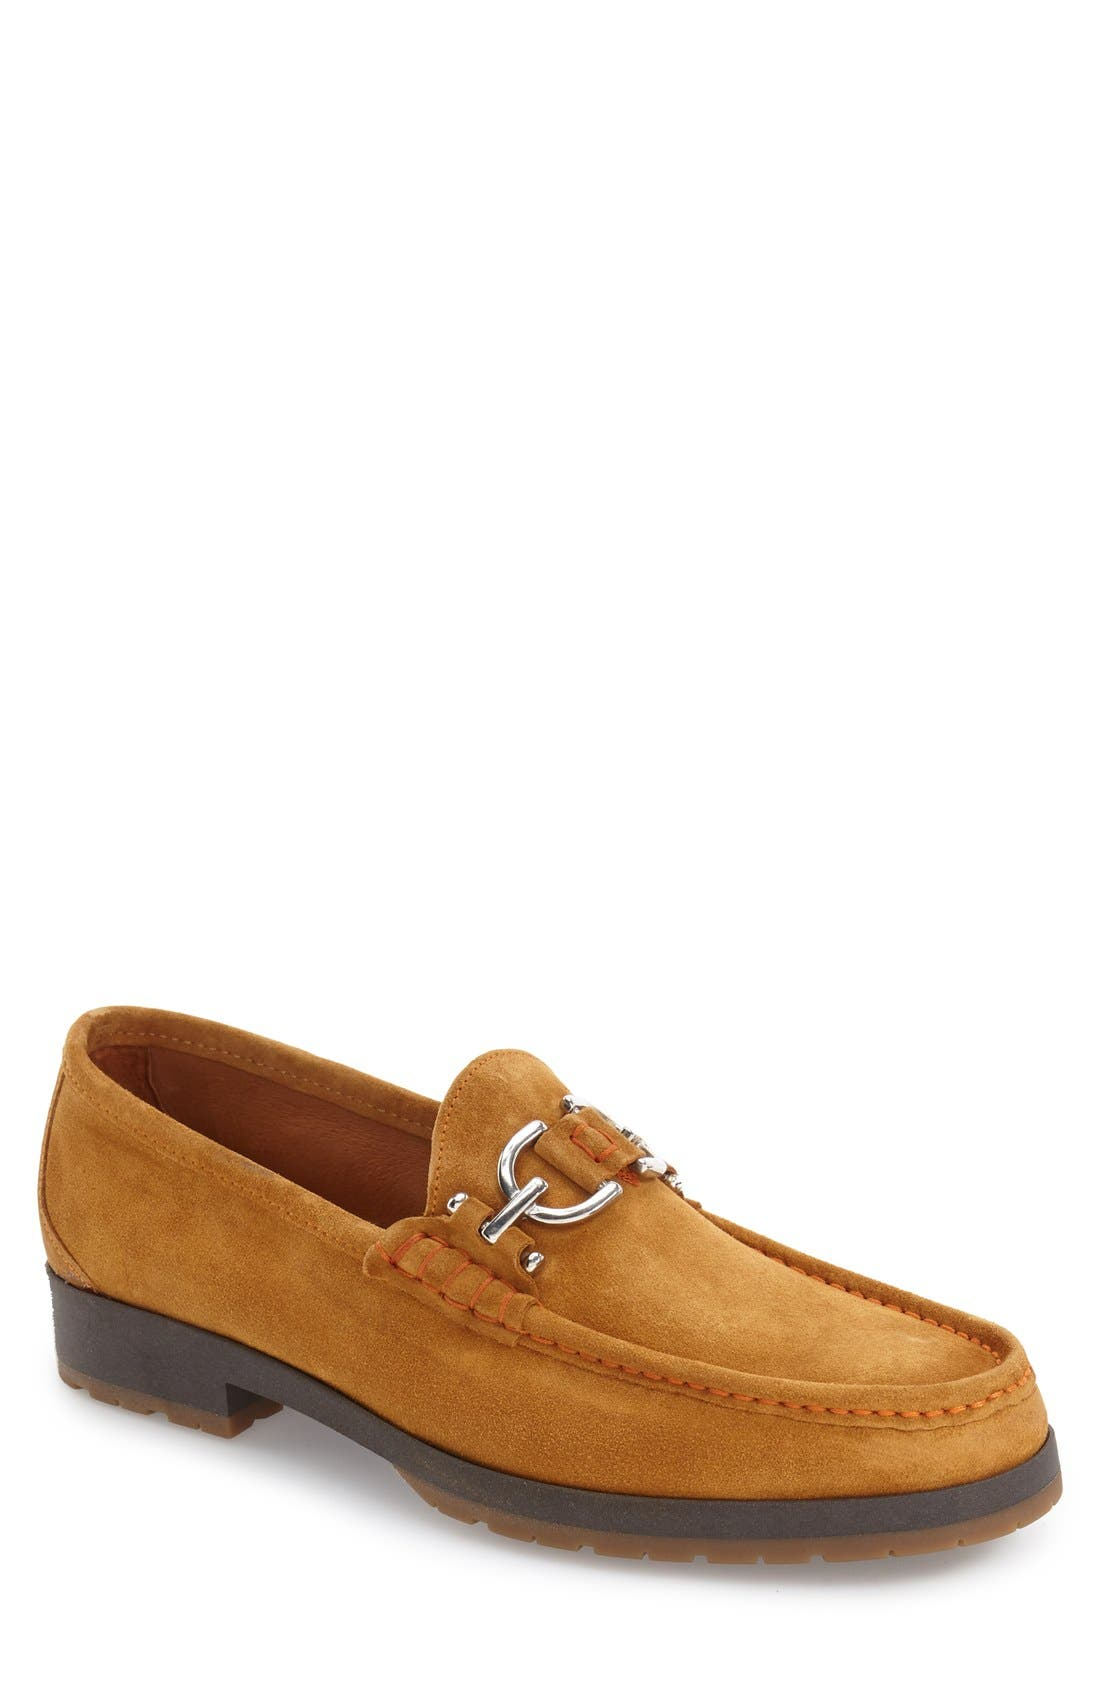 Lelio Bit Loafer,                         Main,                         color, Saddle Suede